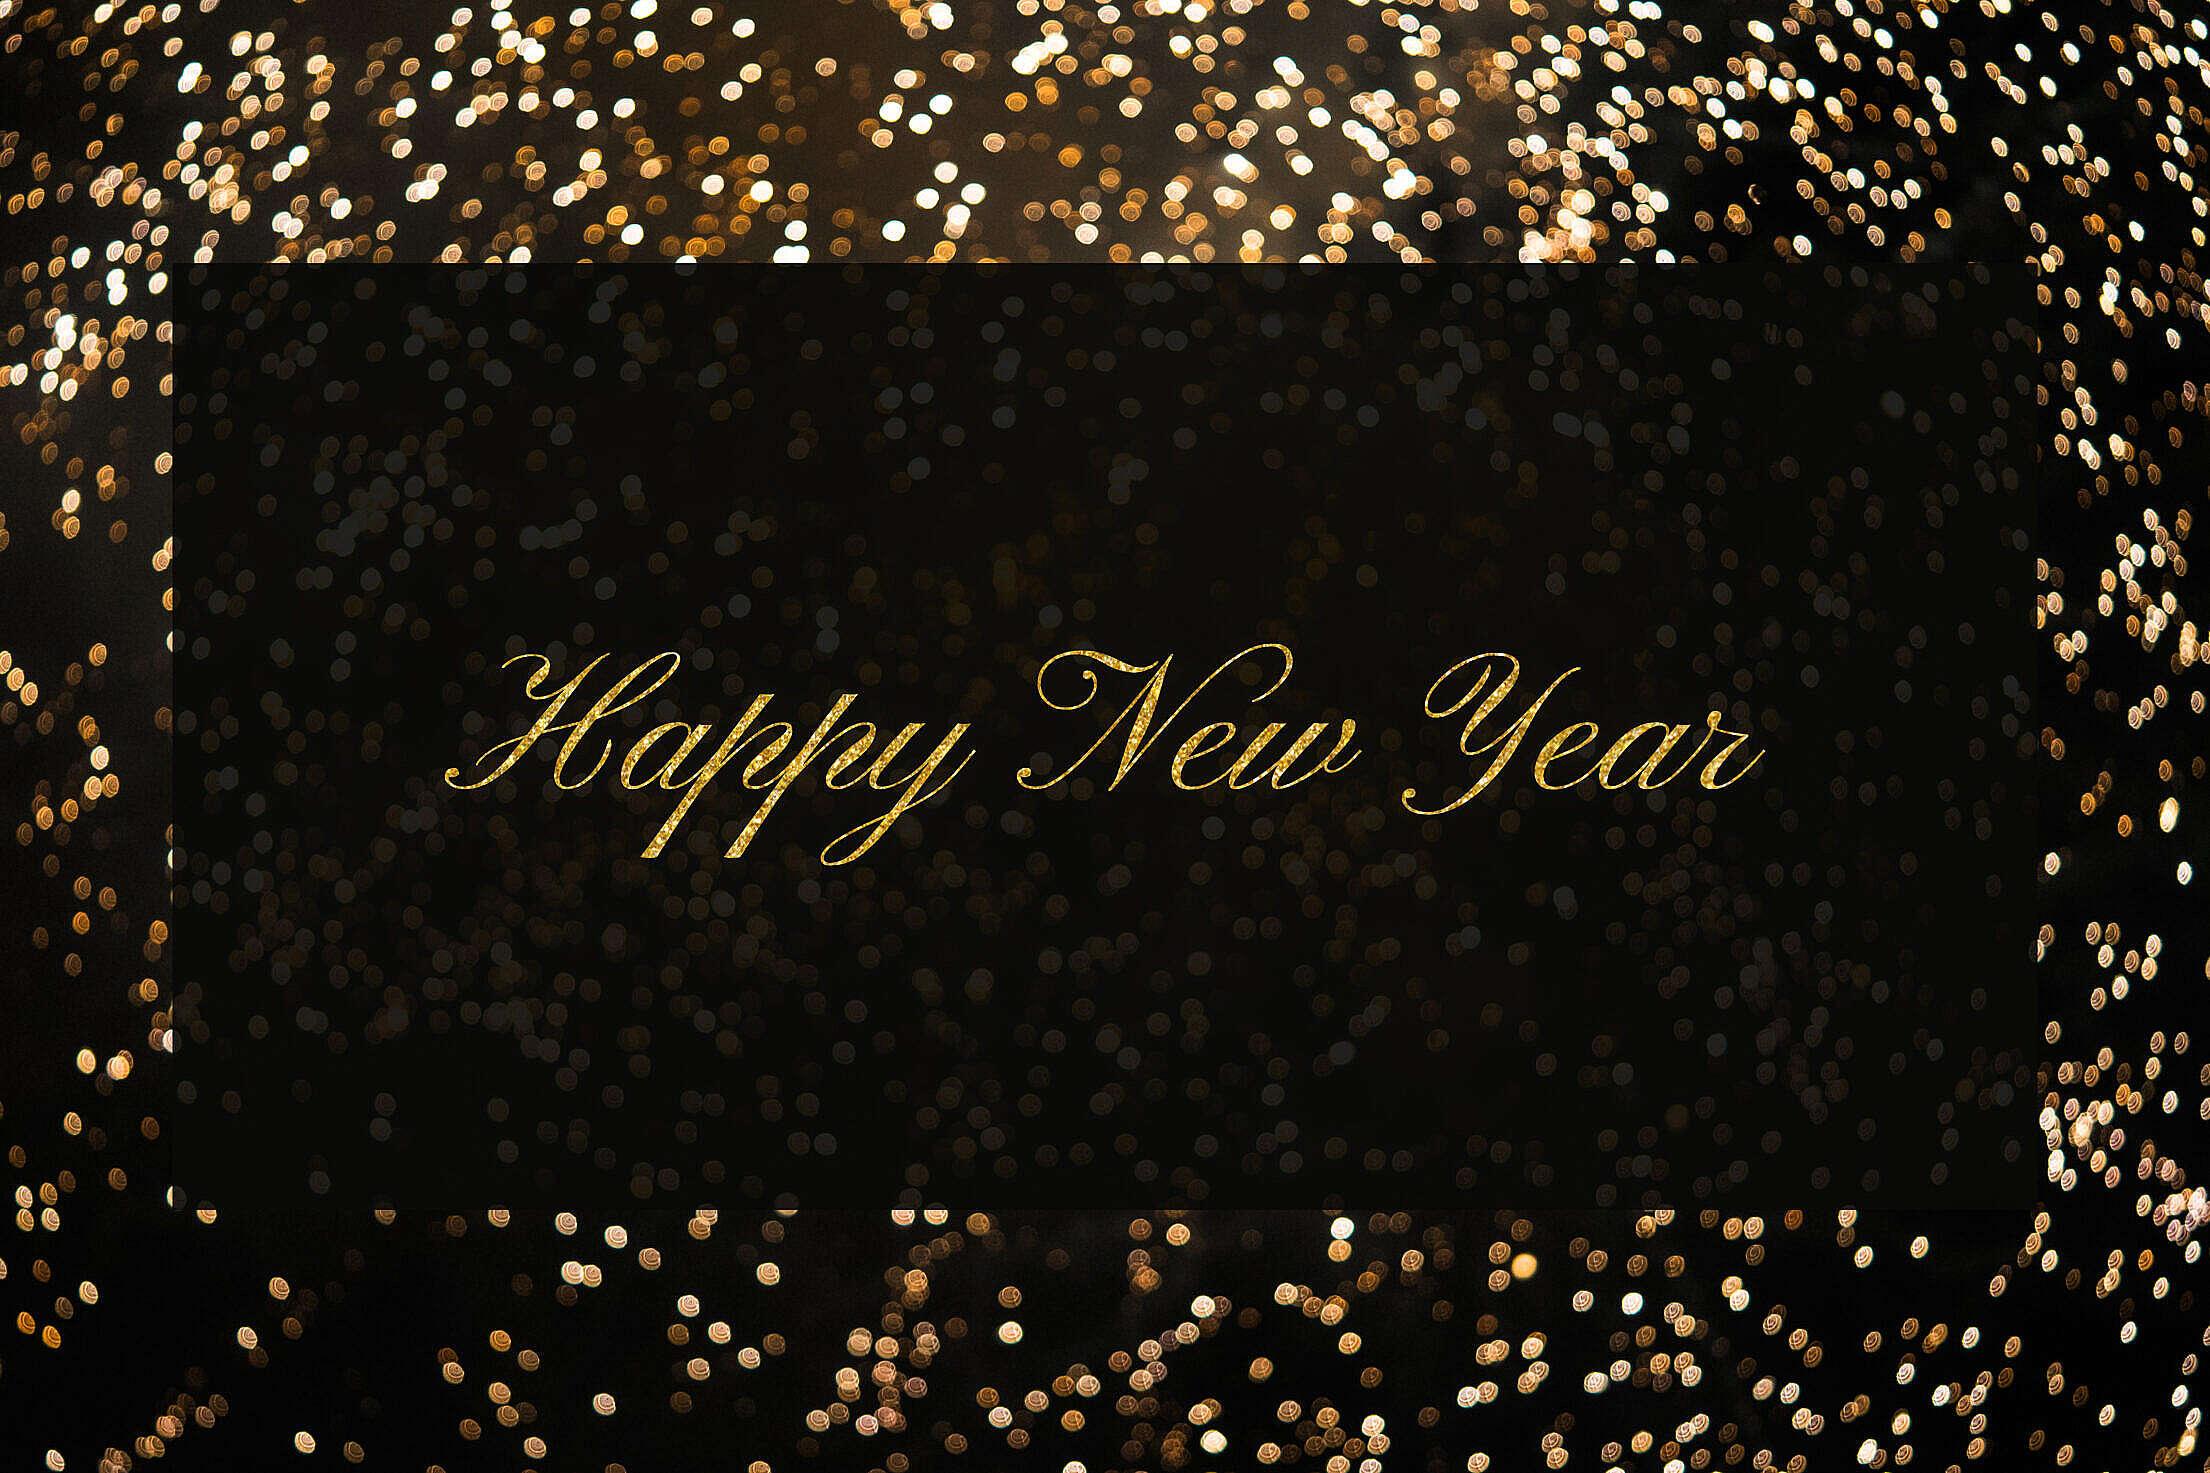 Happy New Year Black Box Free Stock Photo